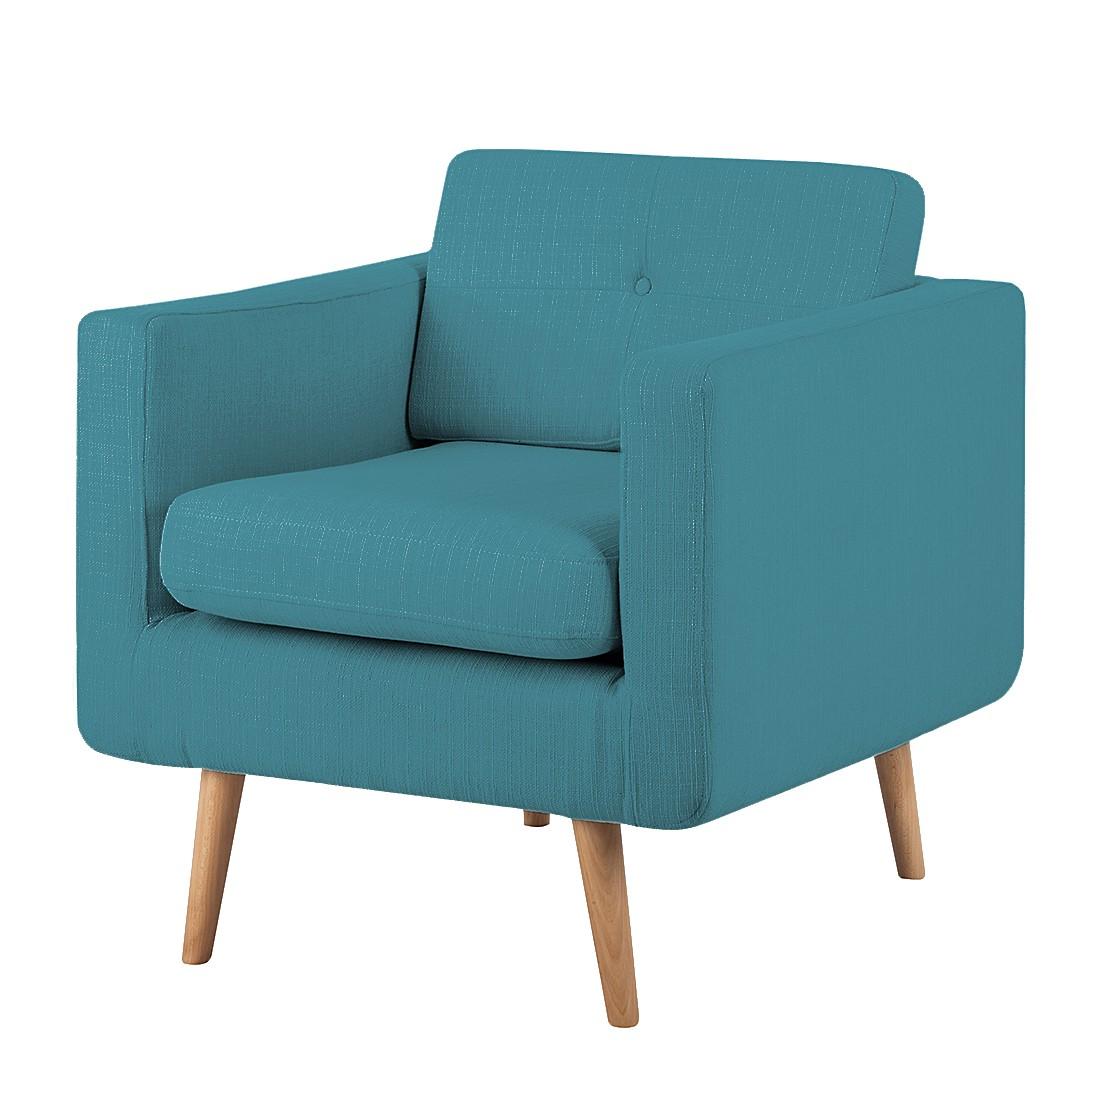 sessel sitzh he 50 cm preisvergleiche. Black Bedroom Furniture Sets. Home Design Ideas